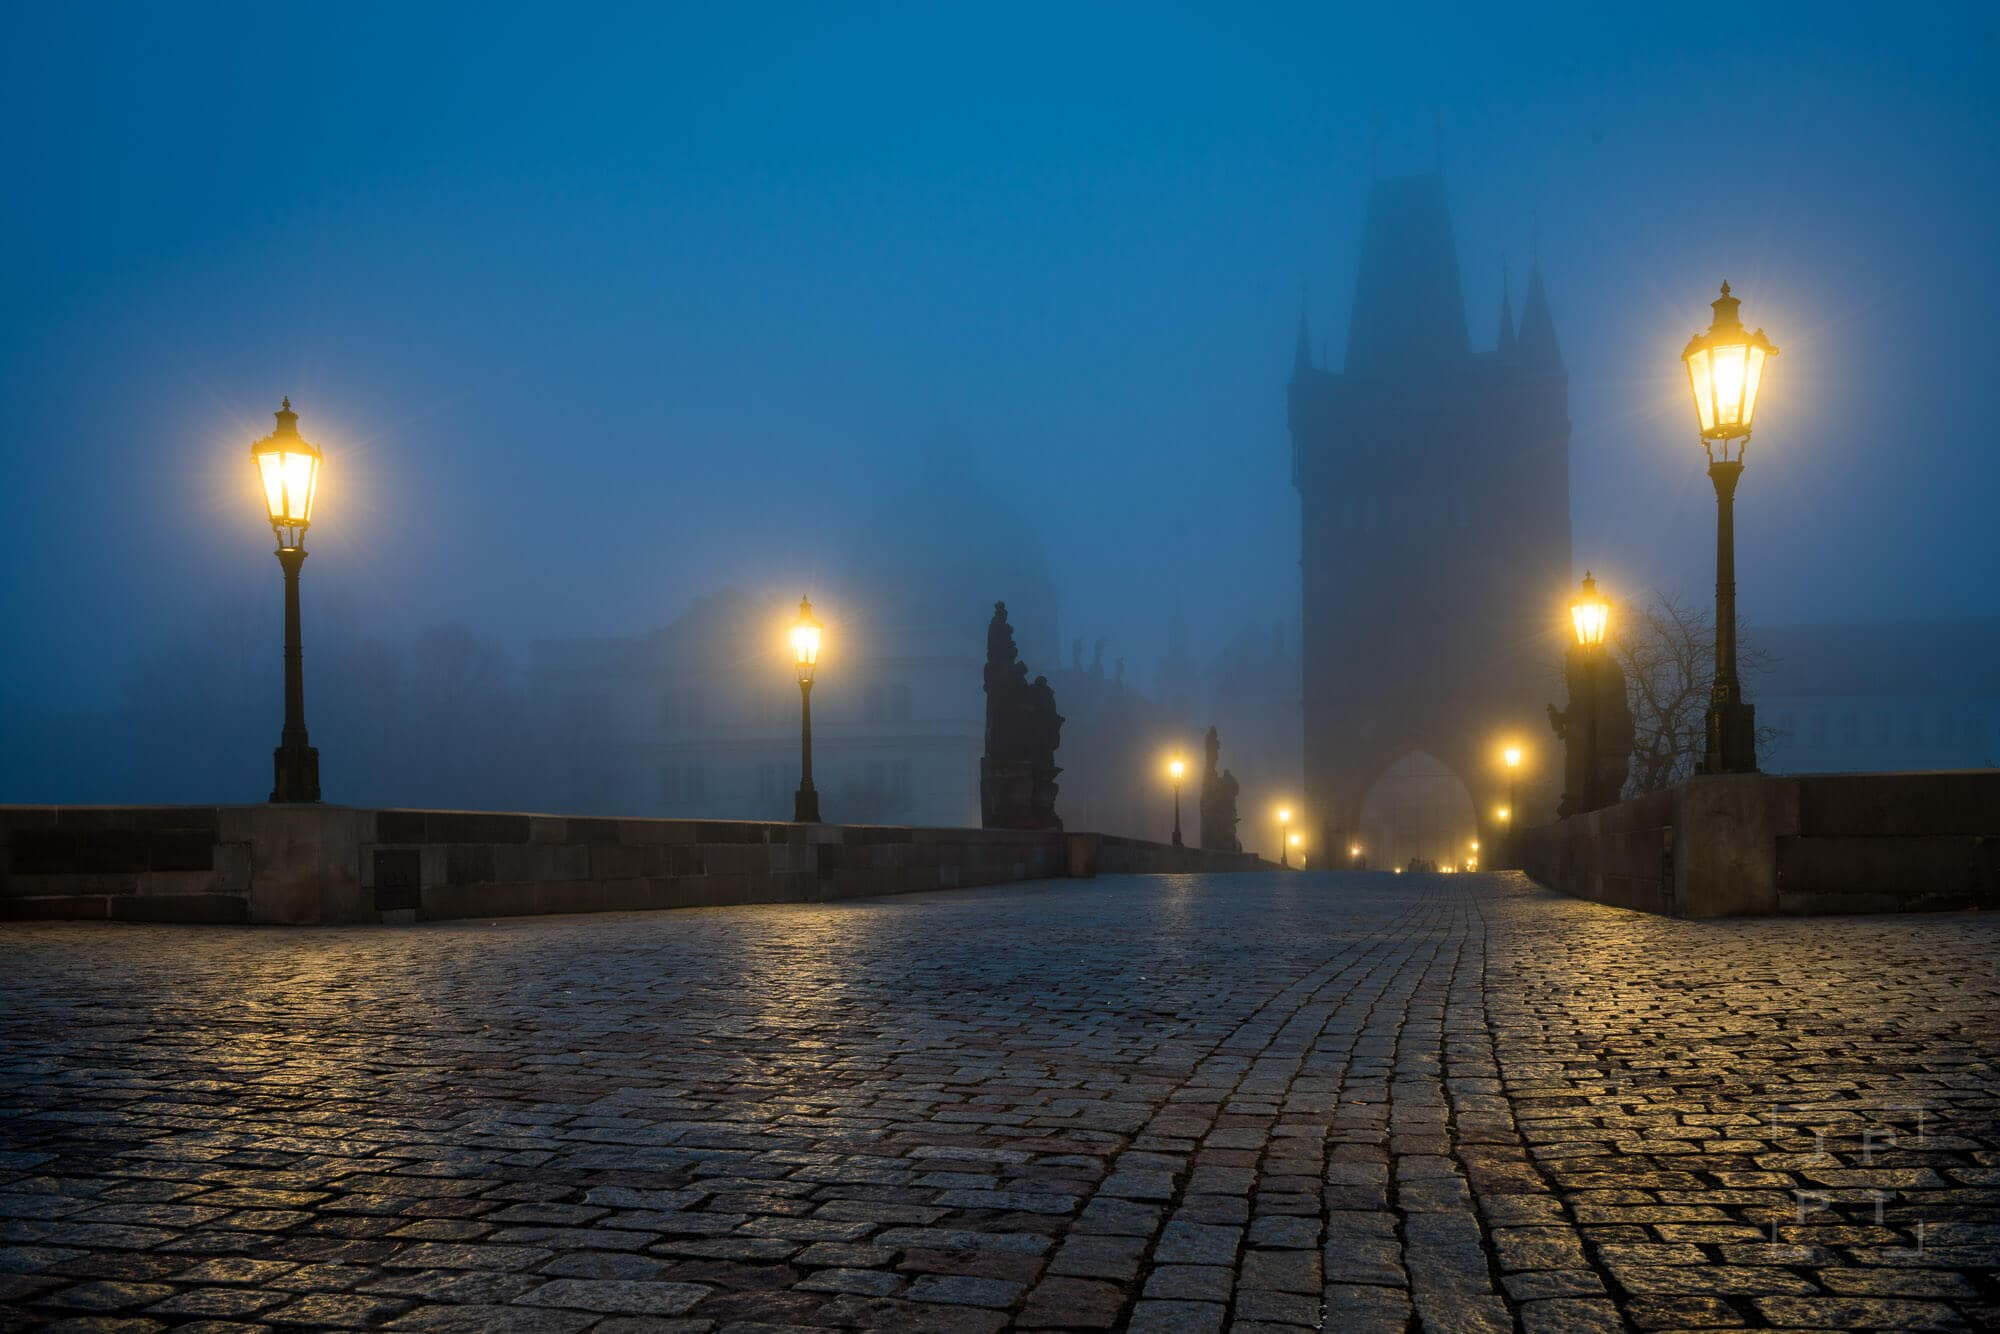 Charles bridge with fog at night, Prague